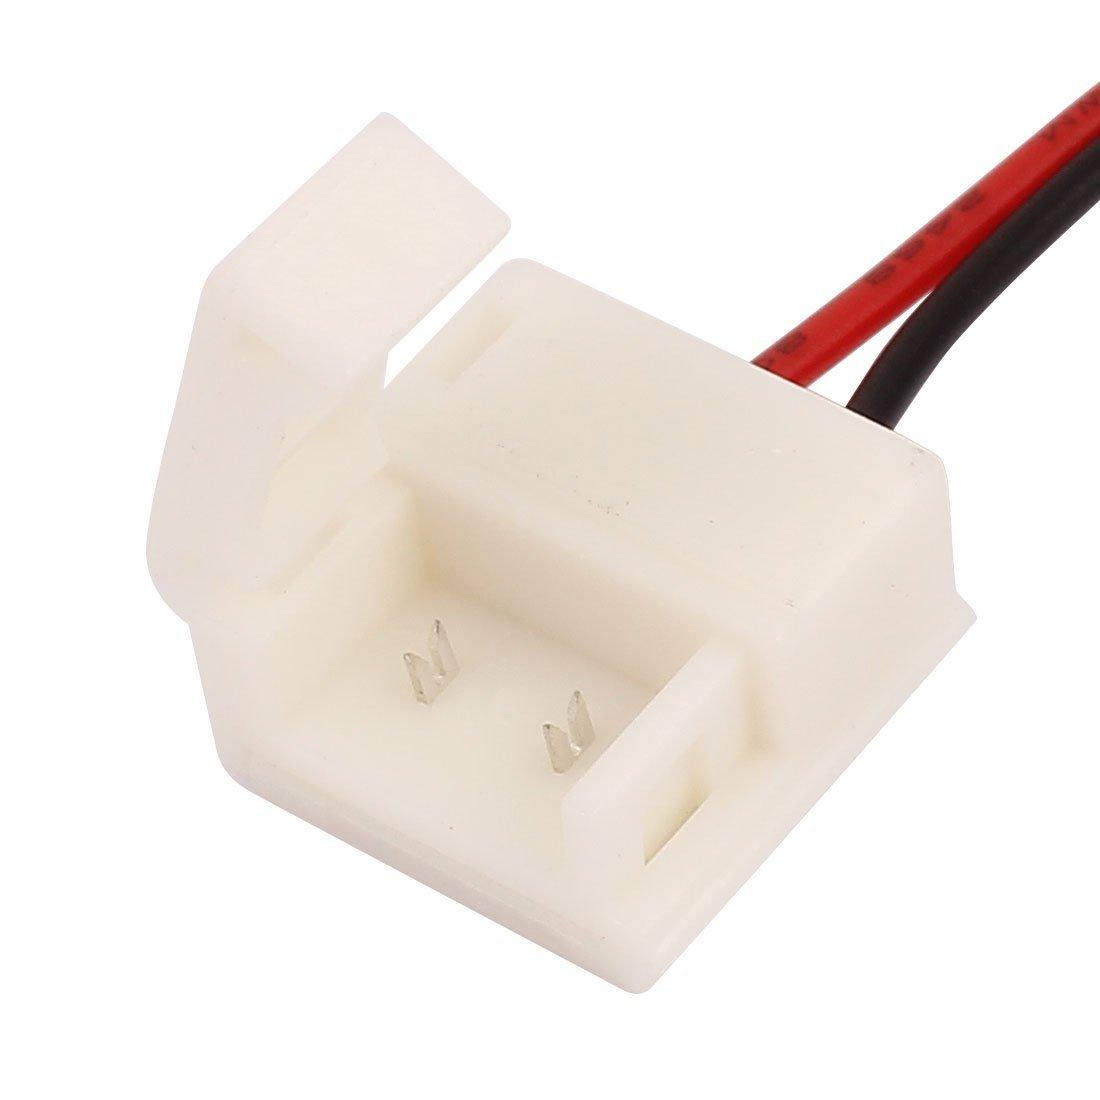 DealMux 2 10pcs Pin conector para 10 mm de largura PCB impermeável de cor única 5050 Faixa de LED - - Amazon.com